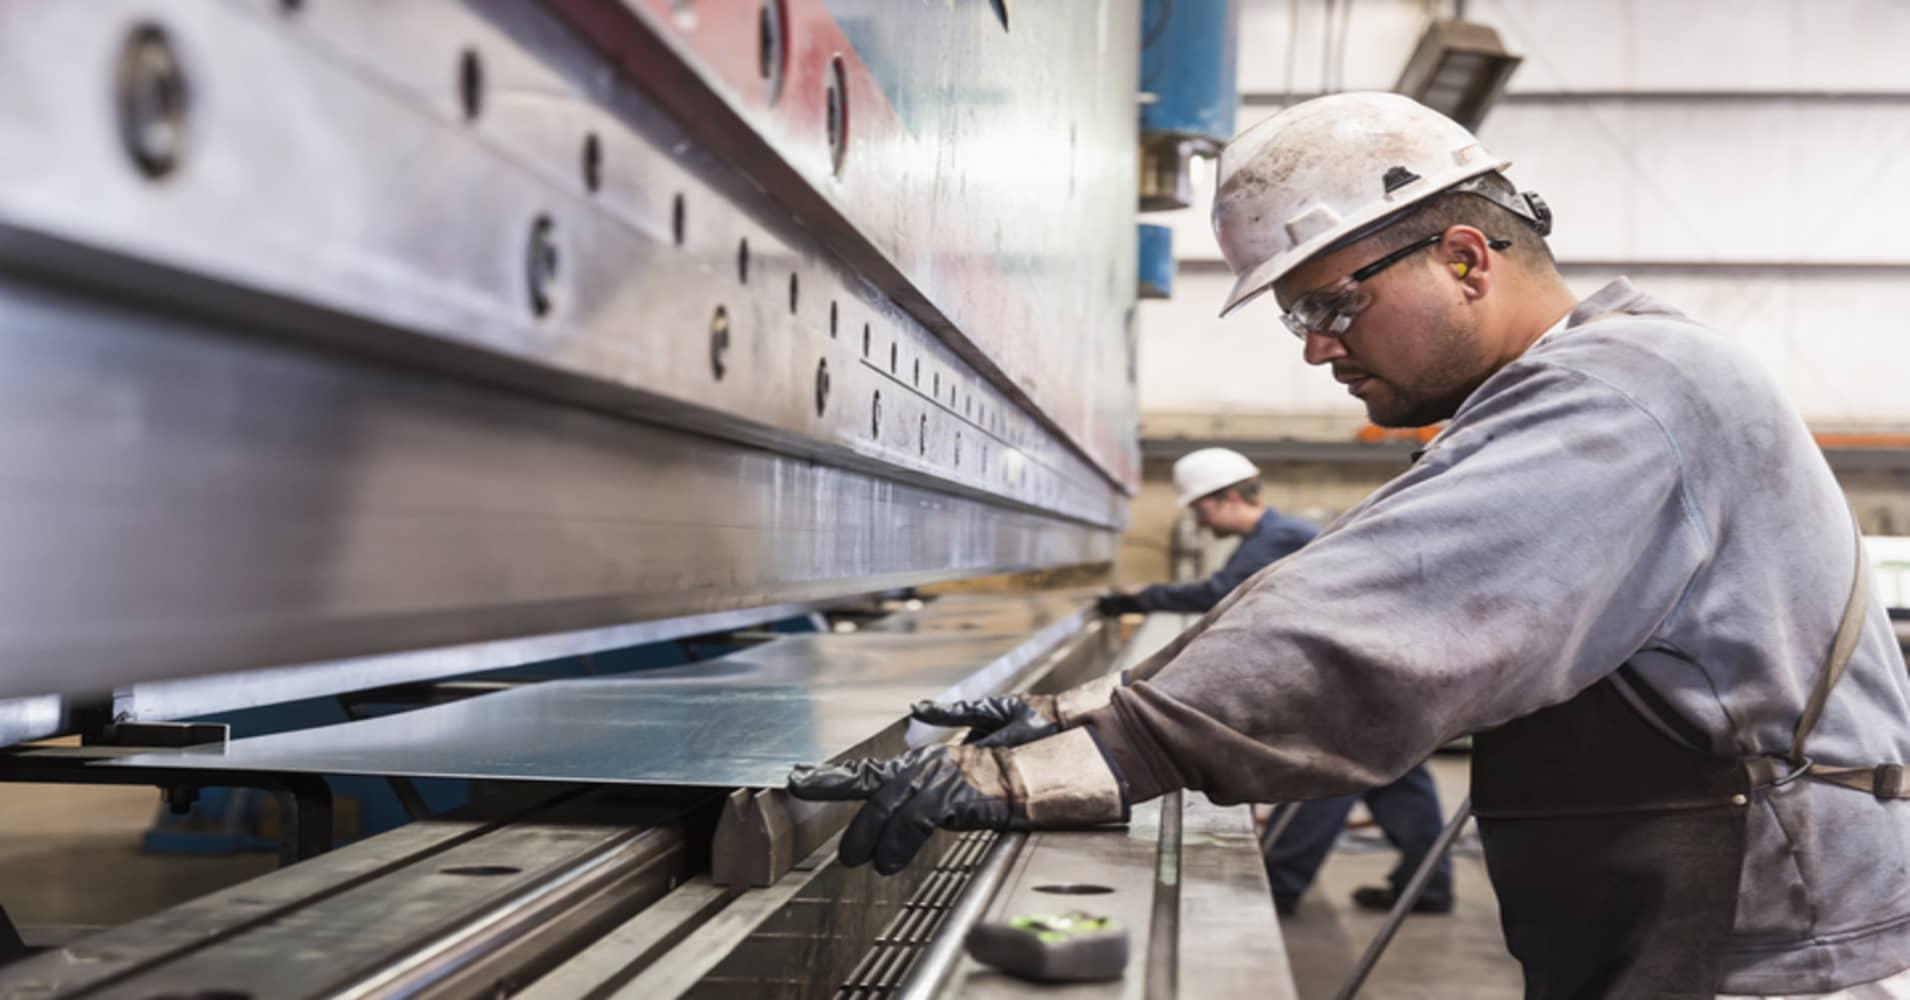 Job growth falls short of expectations in November: 155,000 payrolls created vs 198,000 estimate